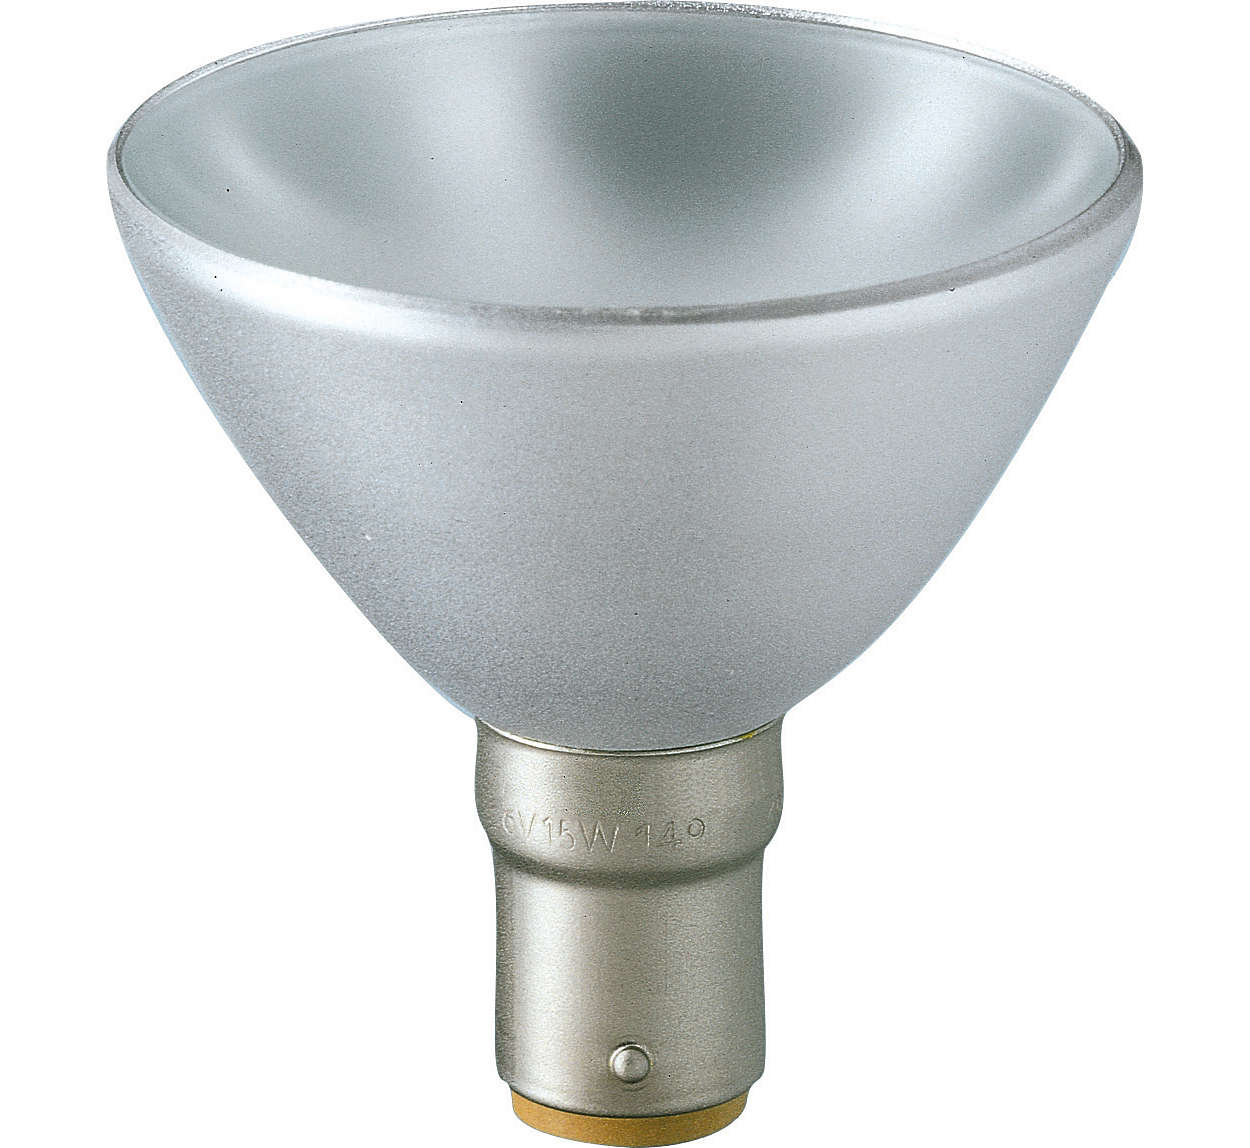 Lampes halogènes réflecteurs en aluminium de Philips